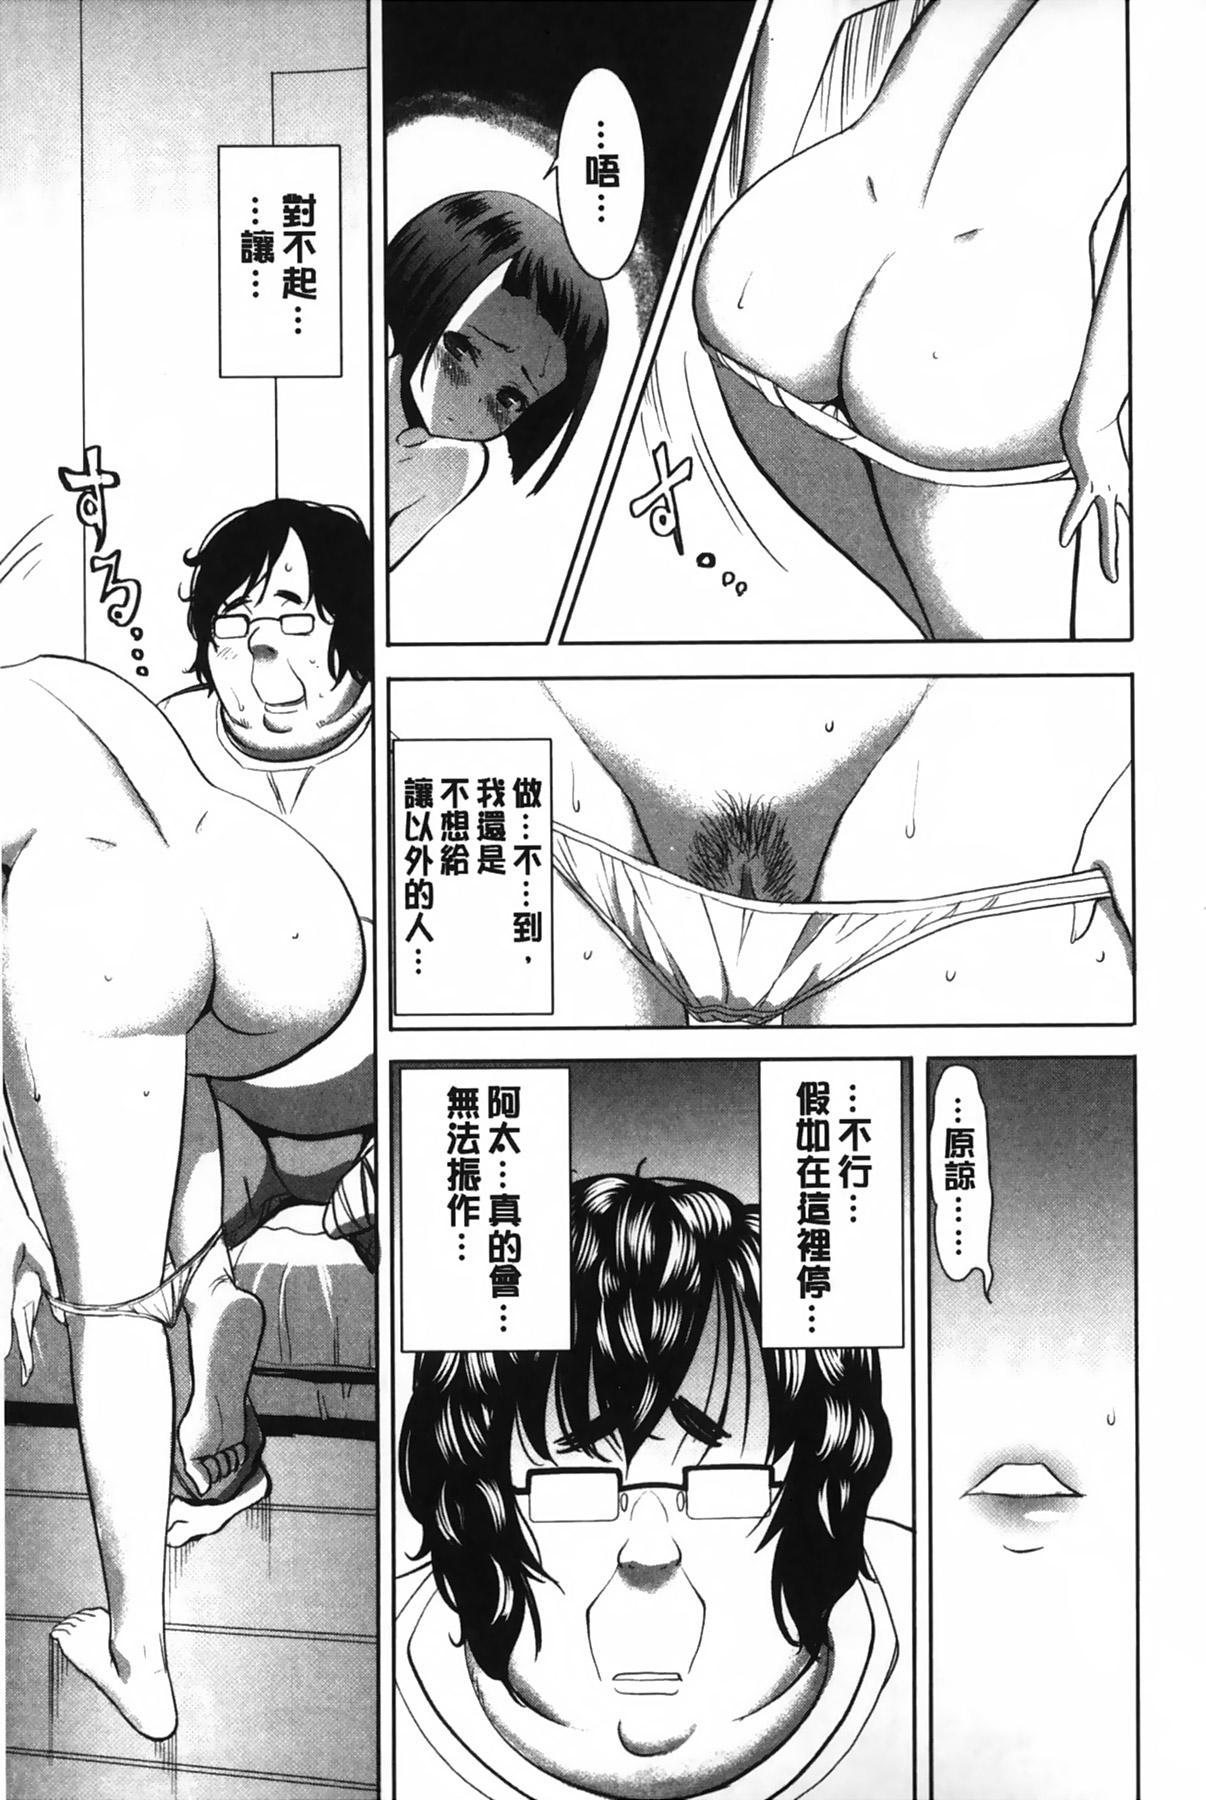 Ane Unsweet - Mihiragi Hiyori + | 姊姊不甜美 彌平木日和+ 21